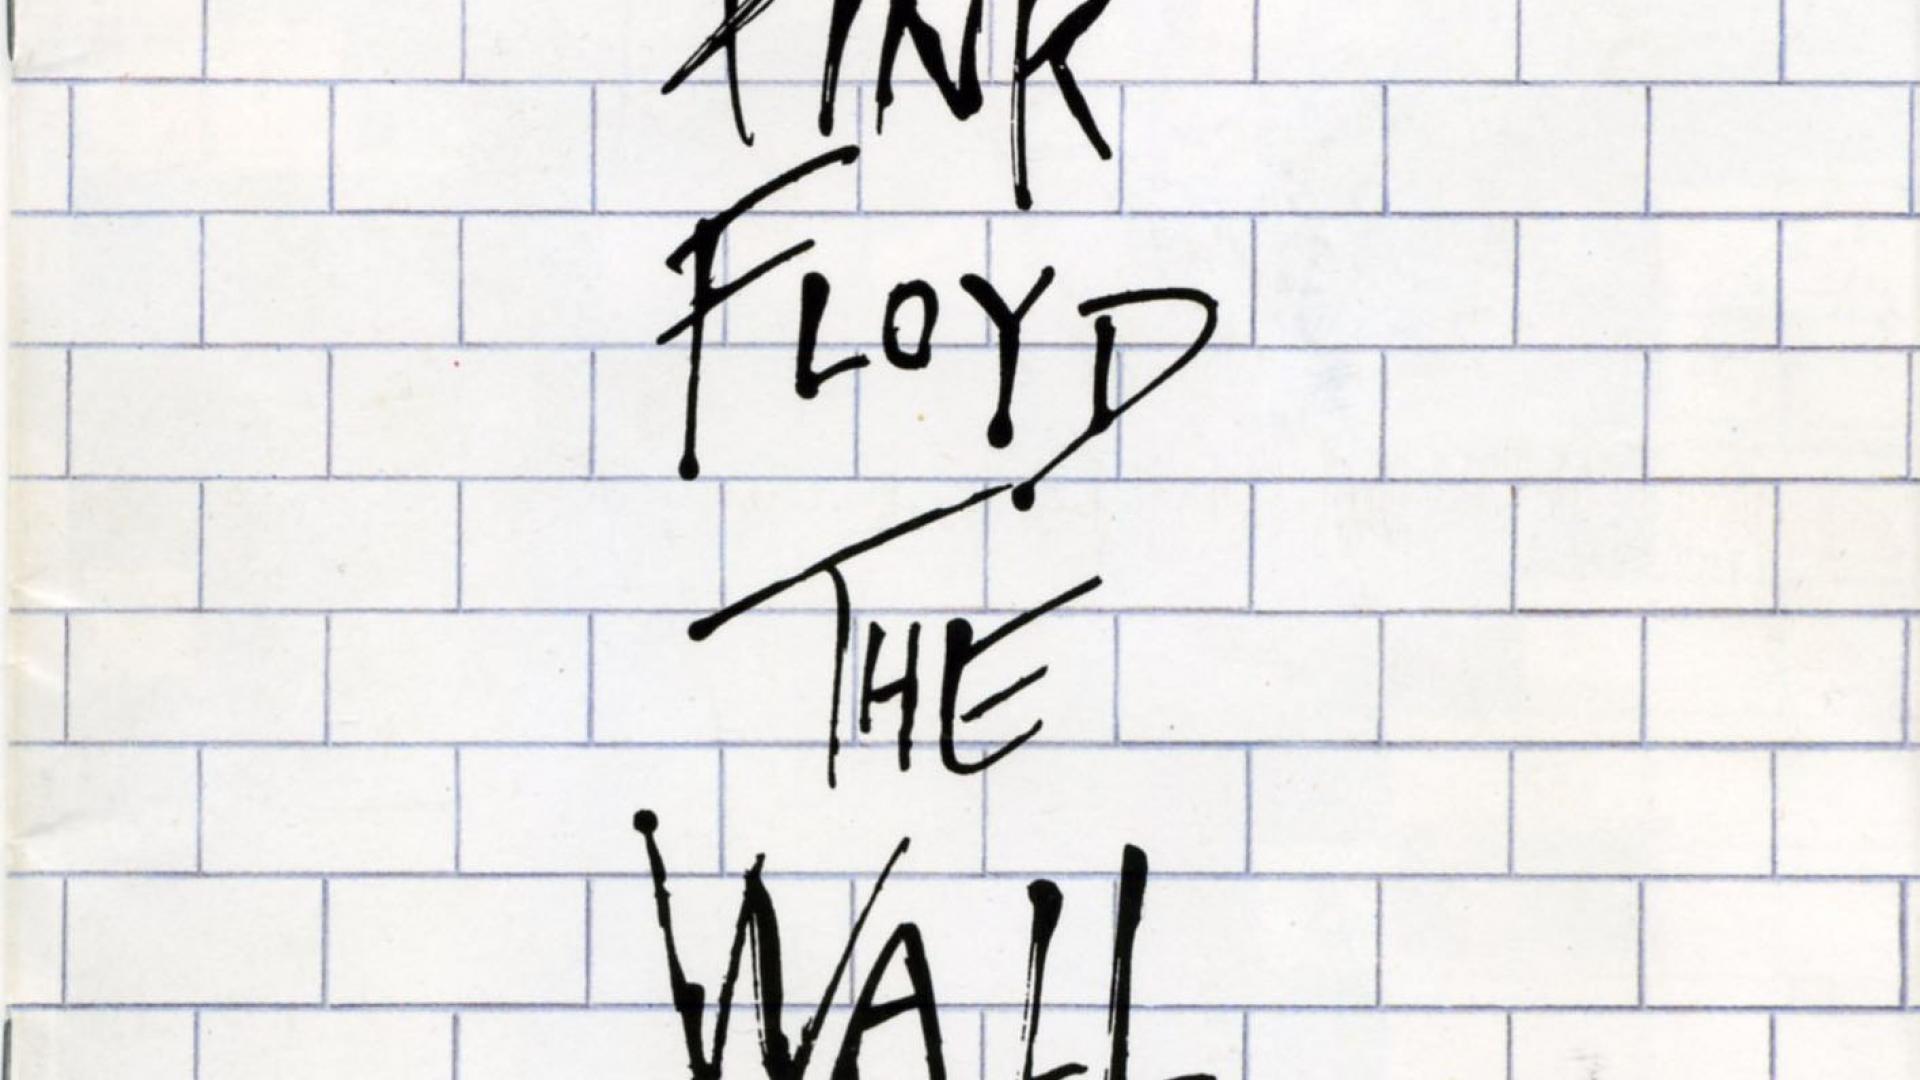 fonds d'écran pink floyd : tous les wallpapers pink floyd